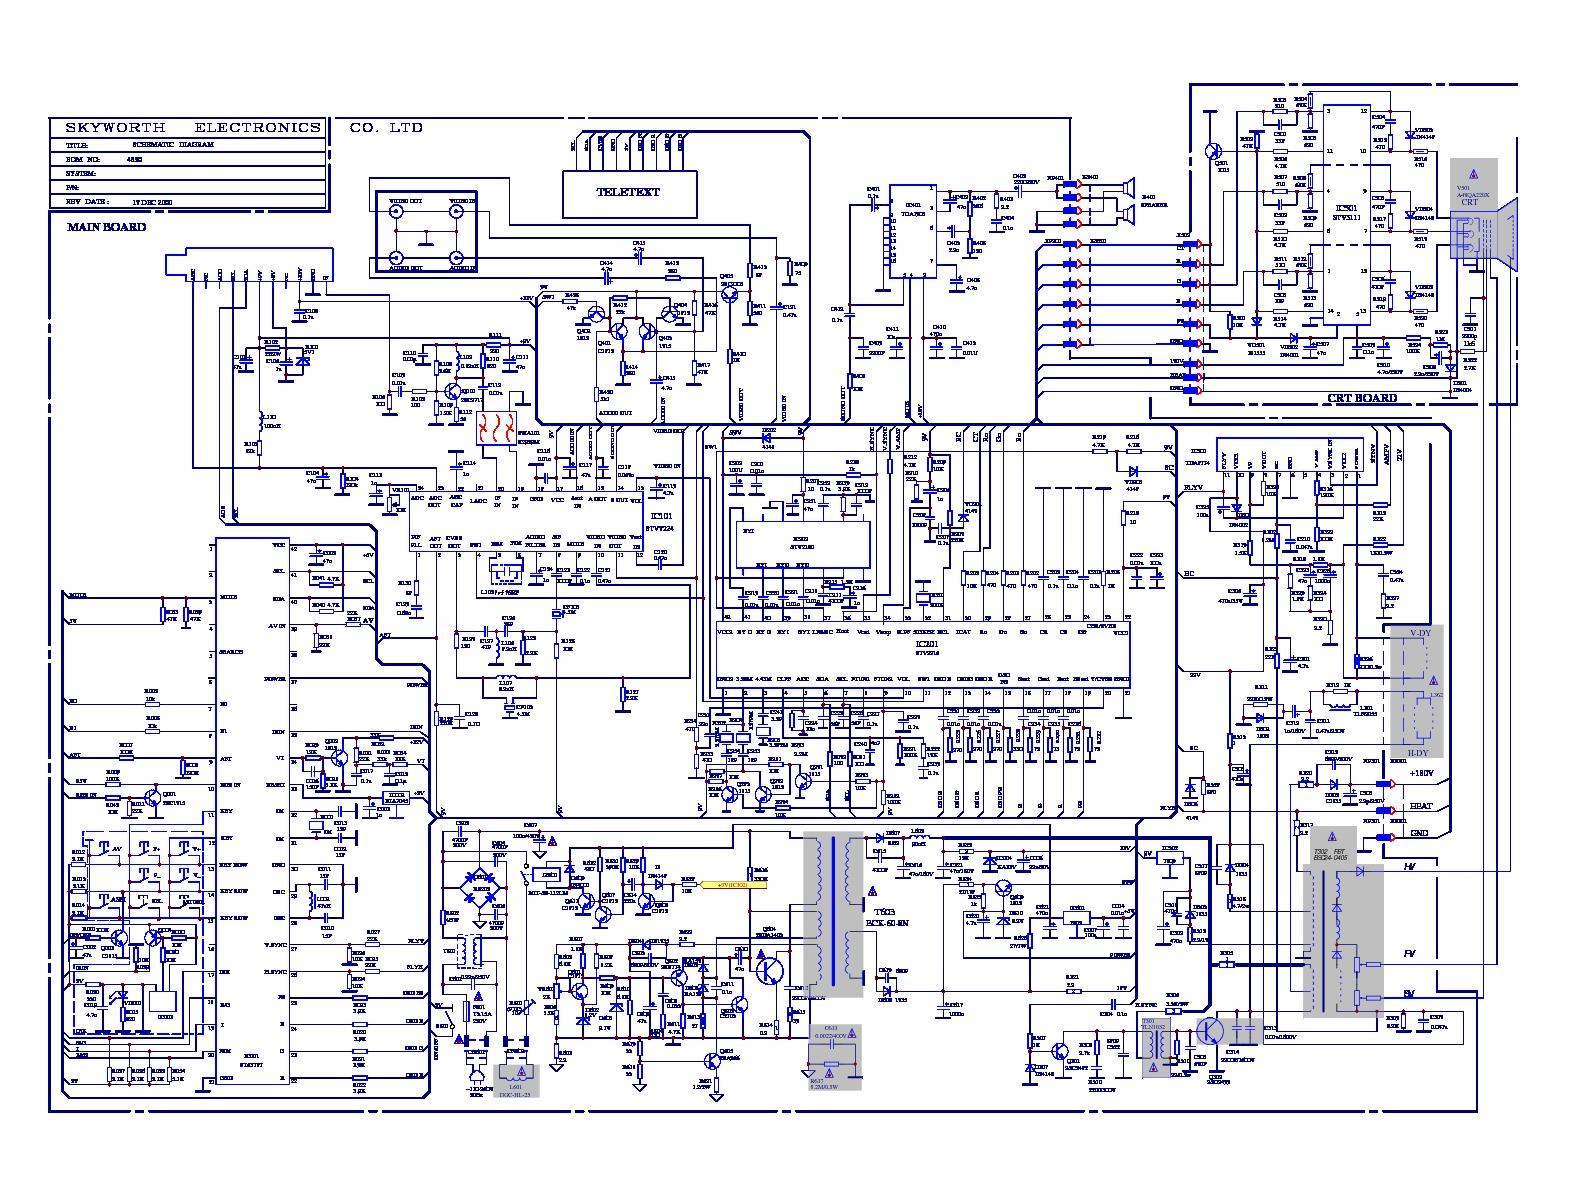 Emerson Etv 2029 4s30 Diagrama Tv Emerson Modelo Etv 2029